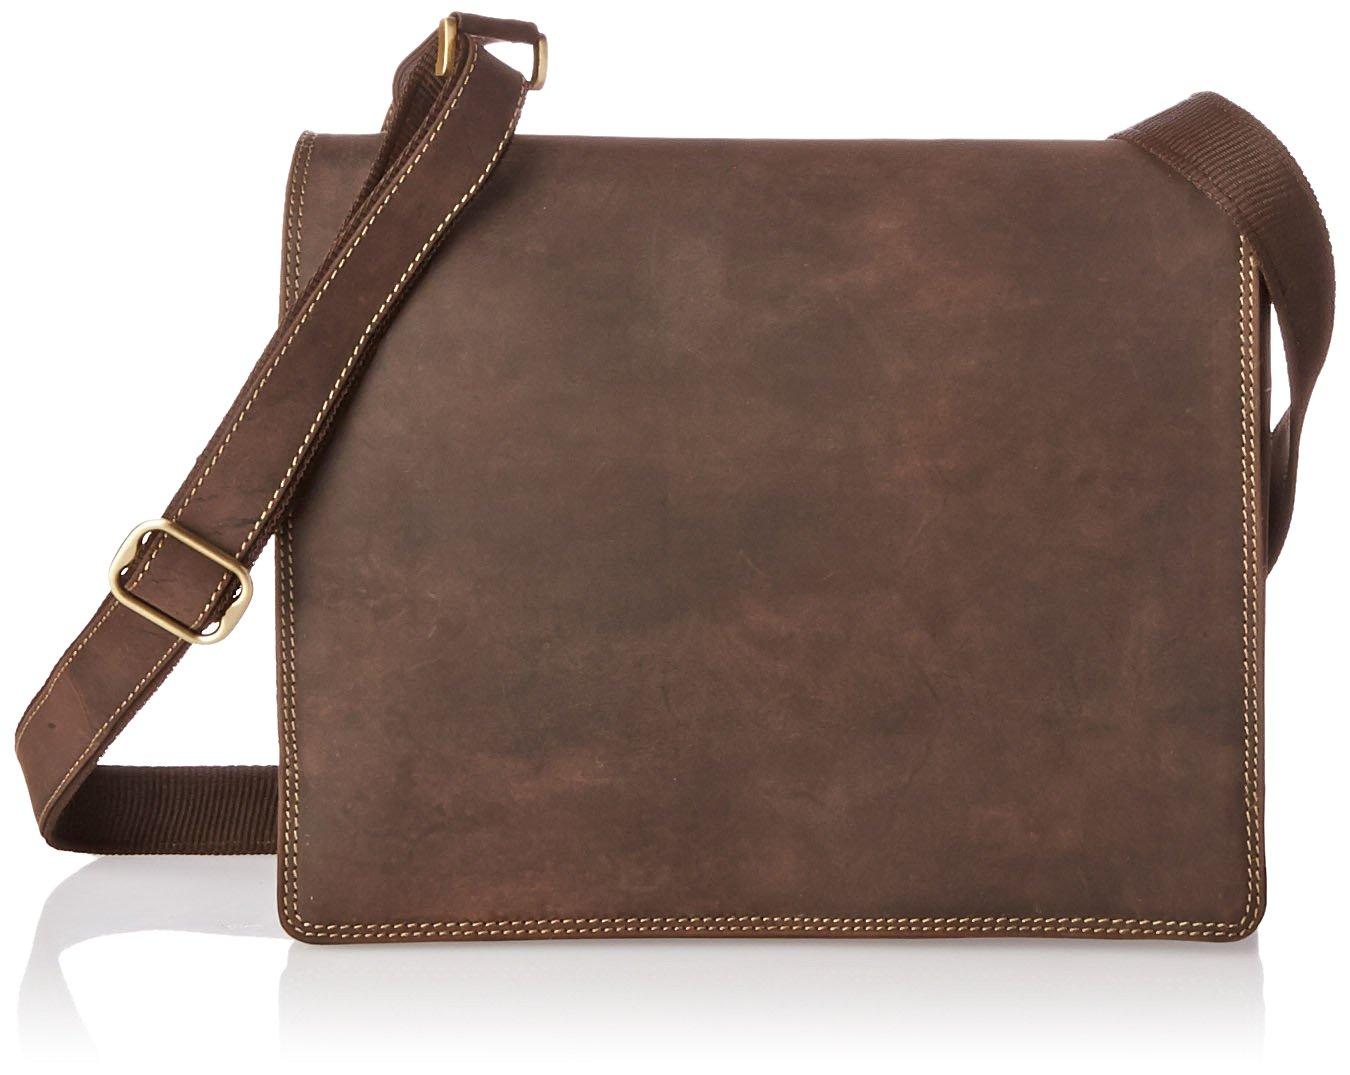 Visconti Harvard Distressed Leather Messenger Bag, Tan, One Size